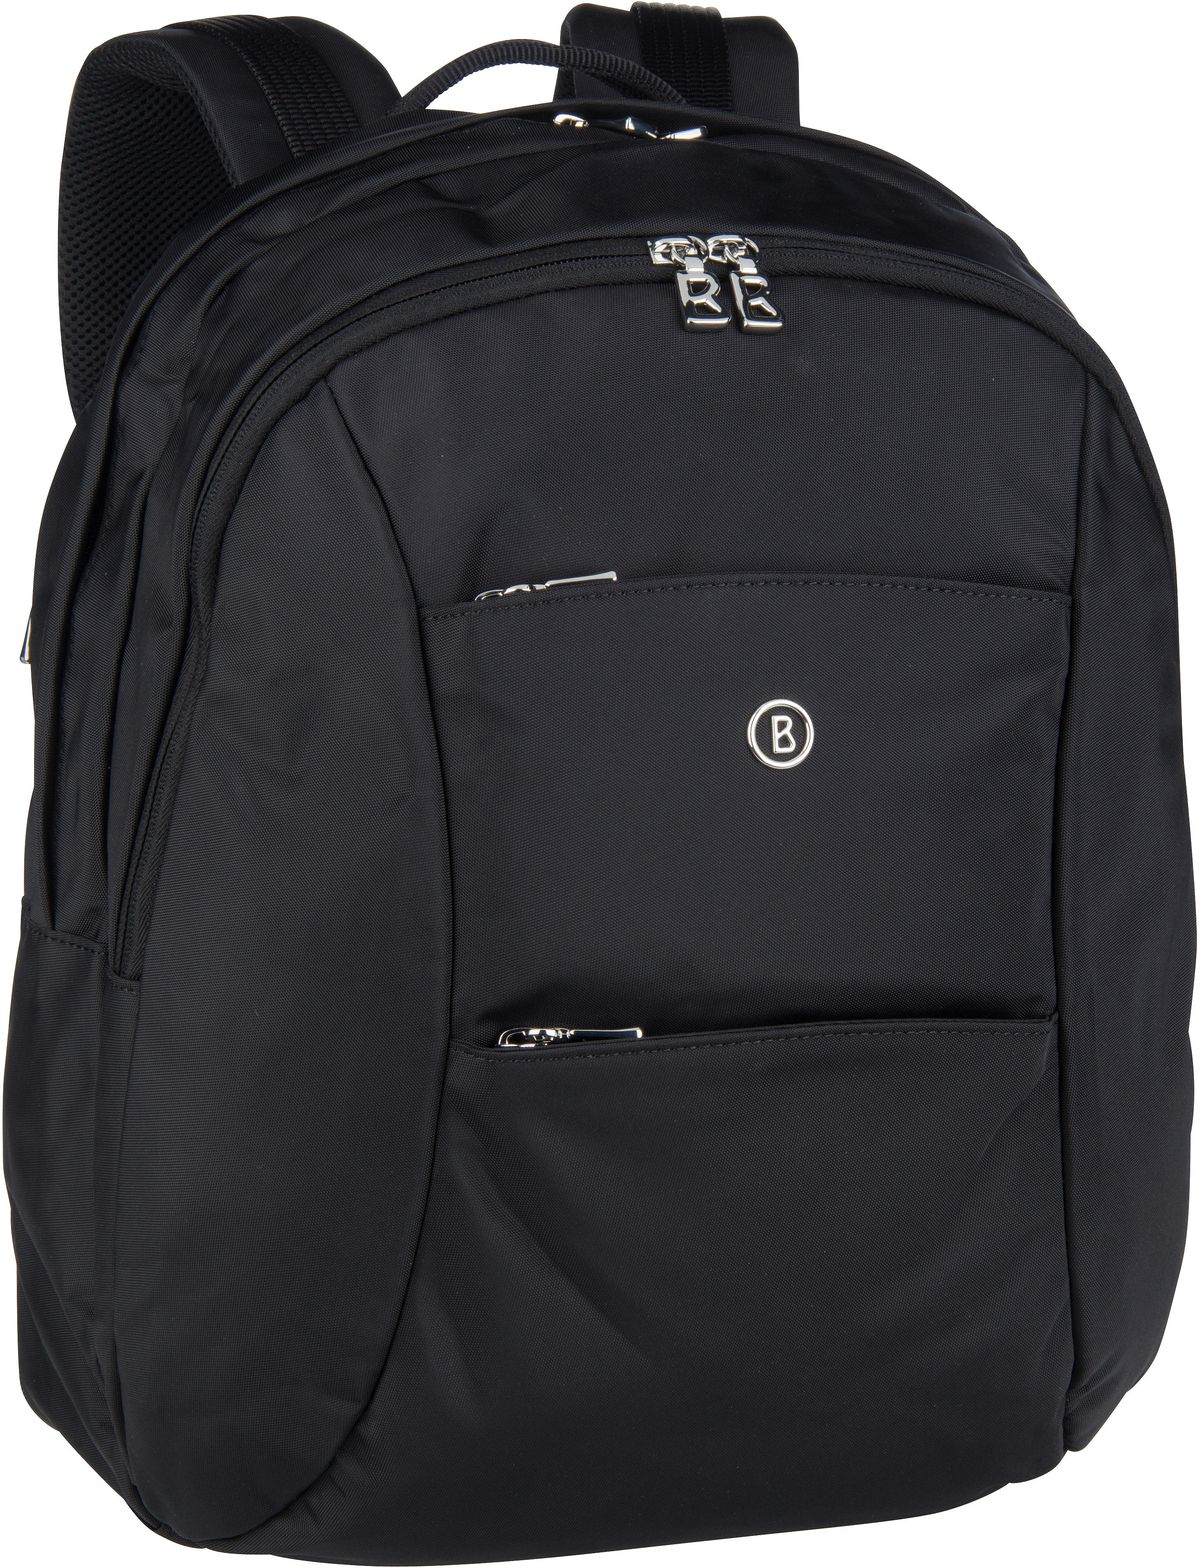 Rucksack / Daypack Verbier Arnt BackPack SVZ Black